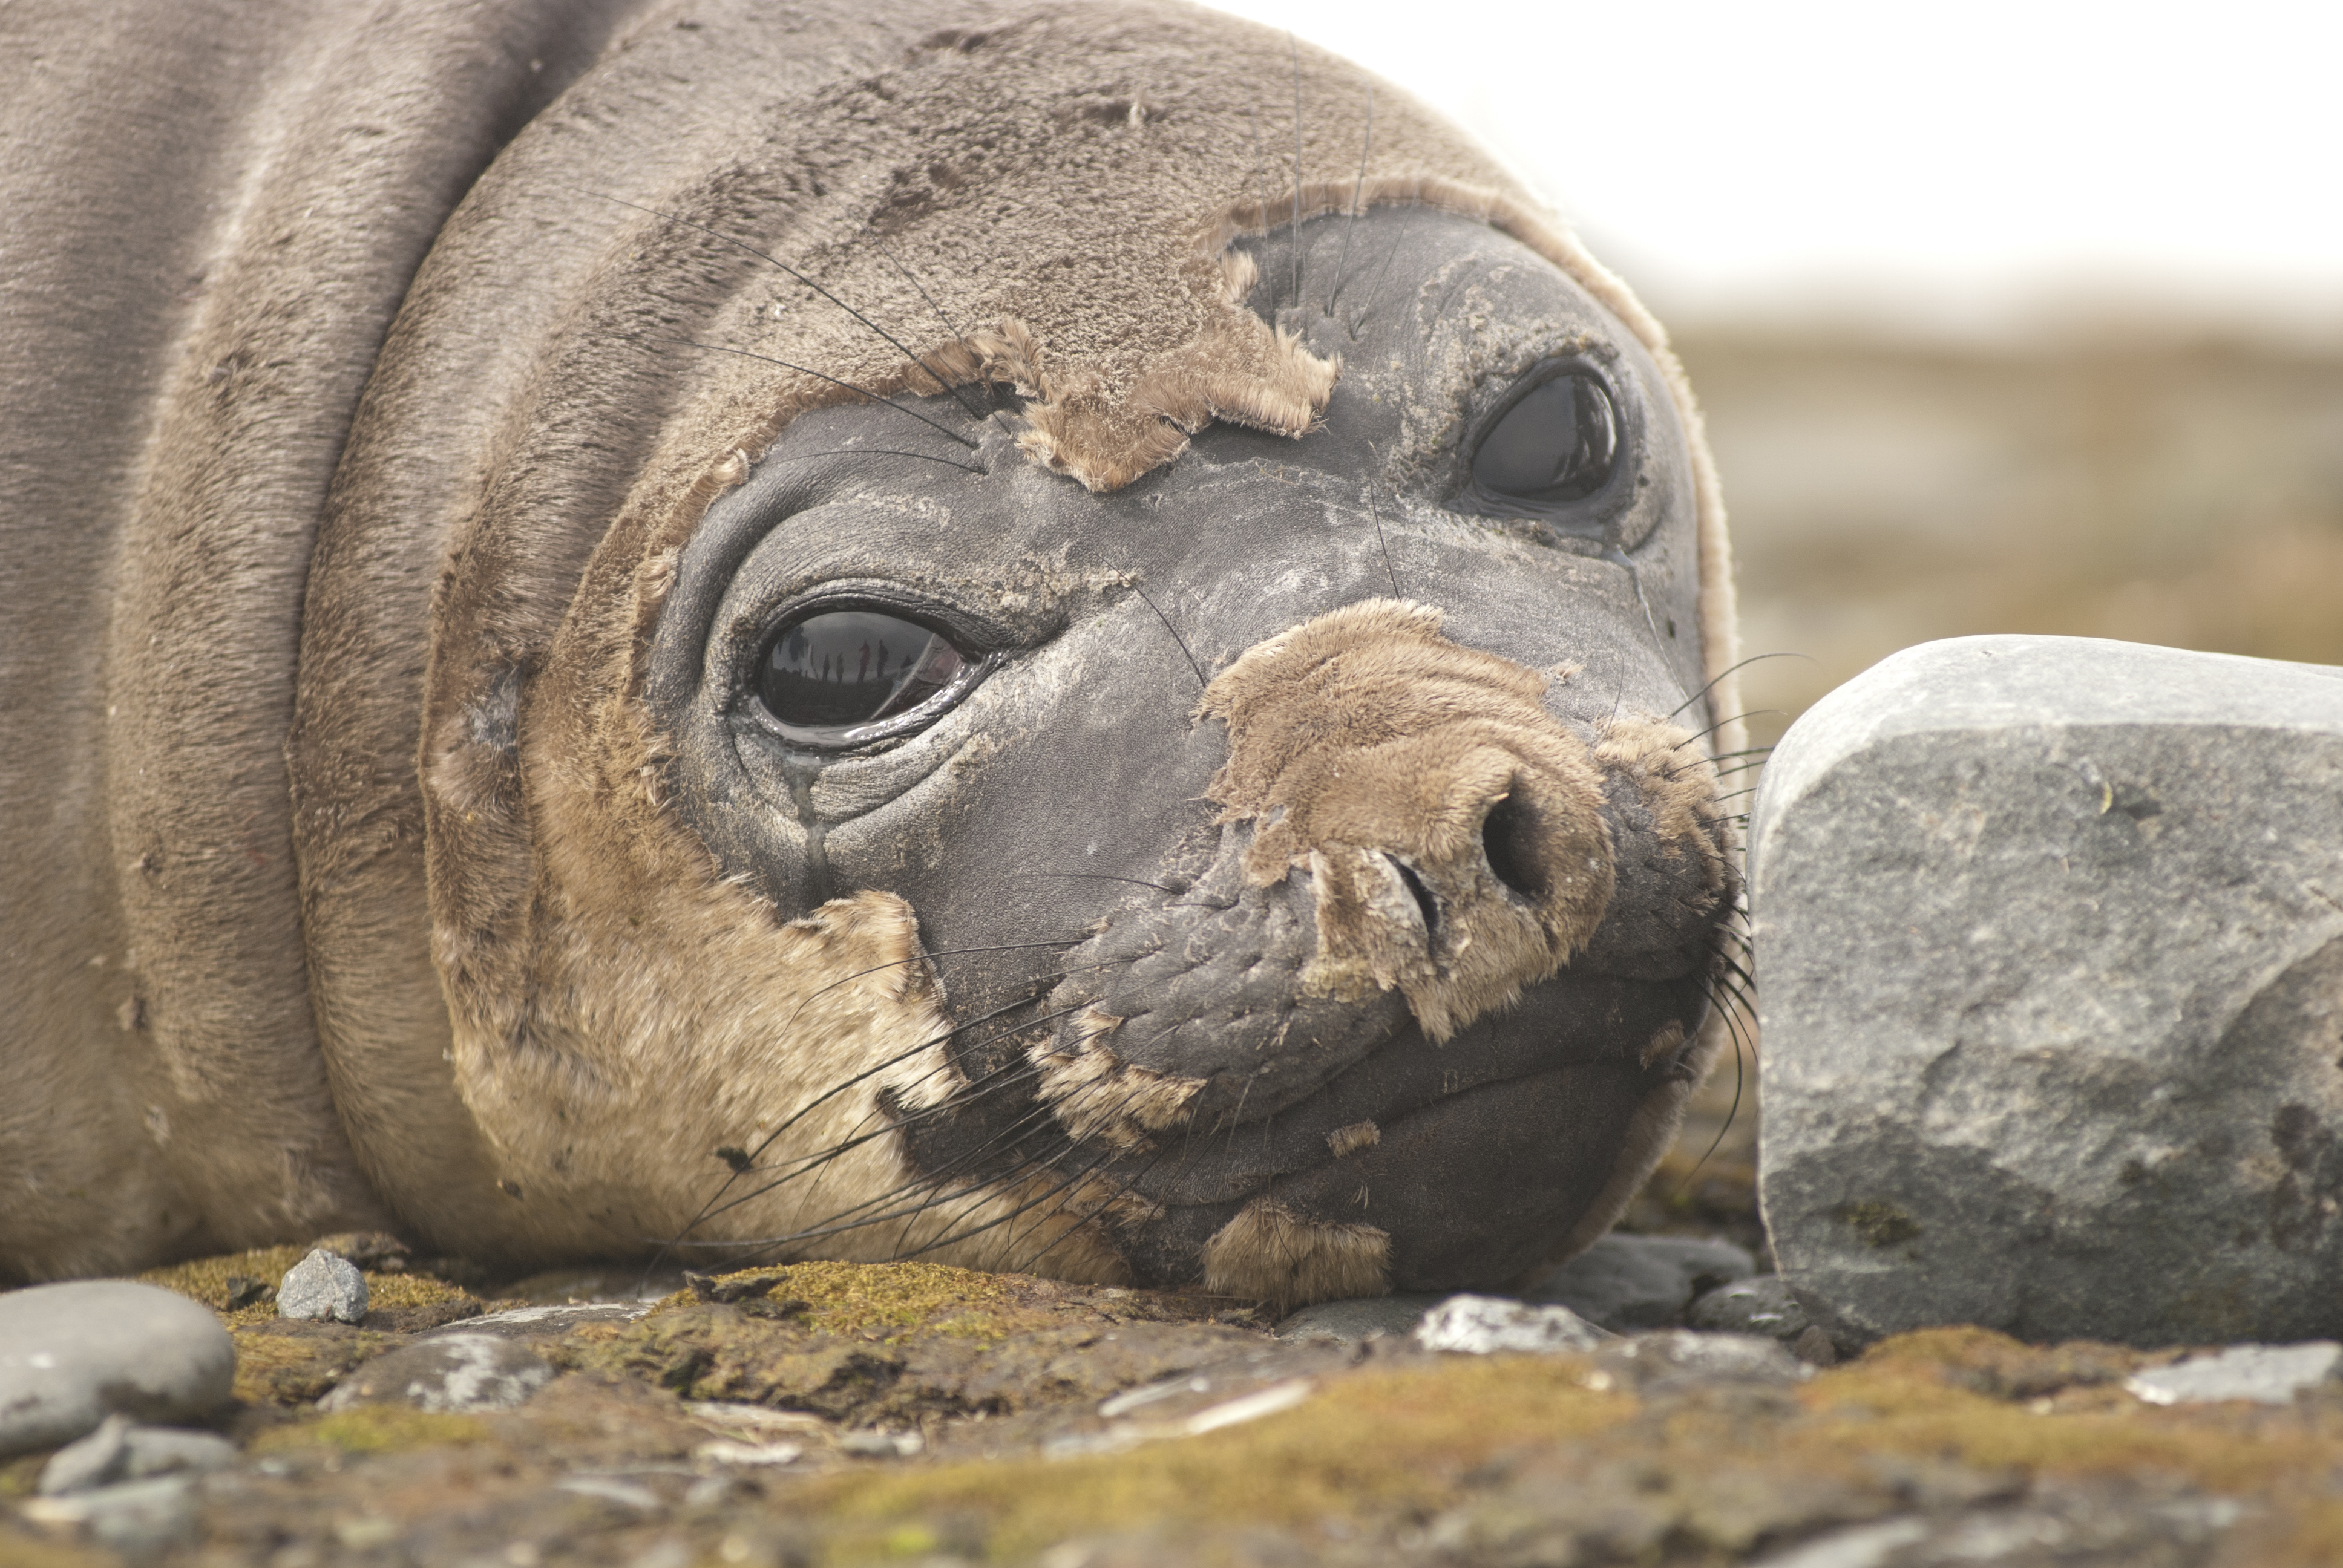 Foca en la Antártida. Imagen: Xiomara Cantera / MNCN